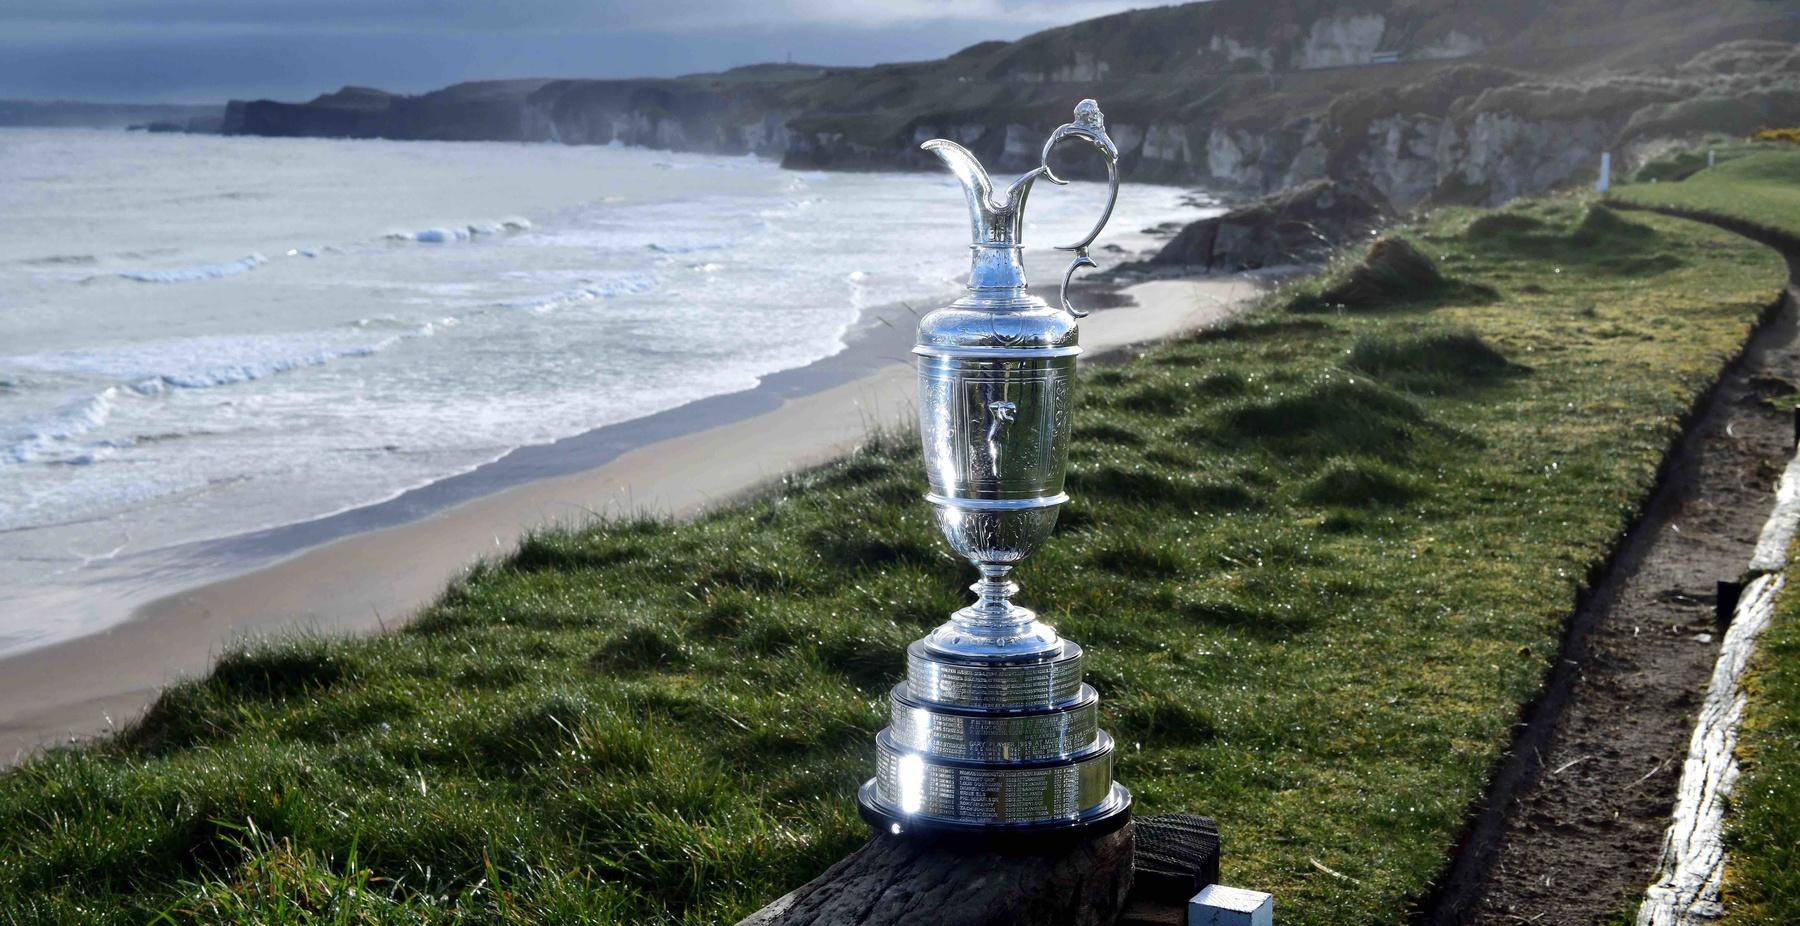 148th Open Championship Media Day – Royal Portrush